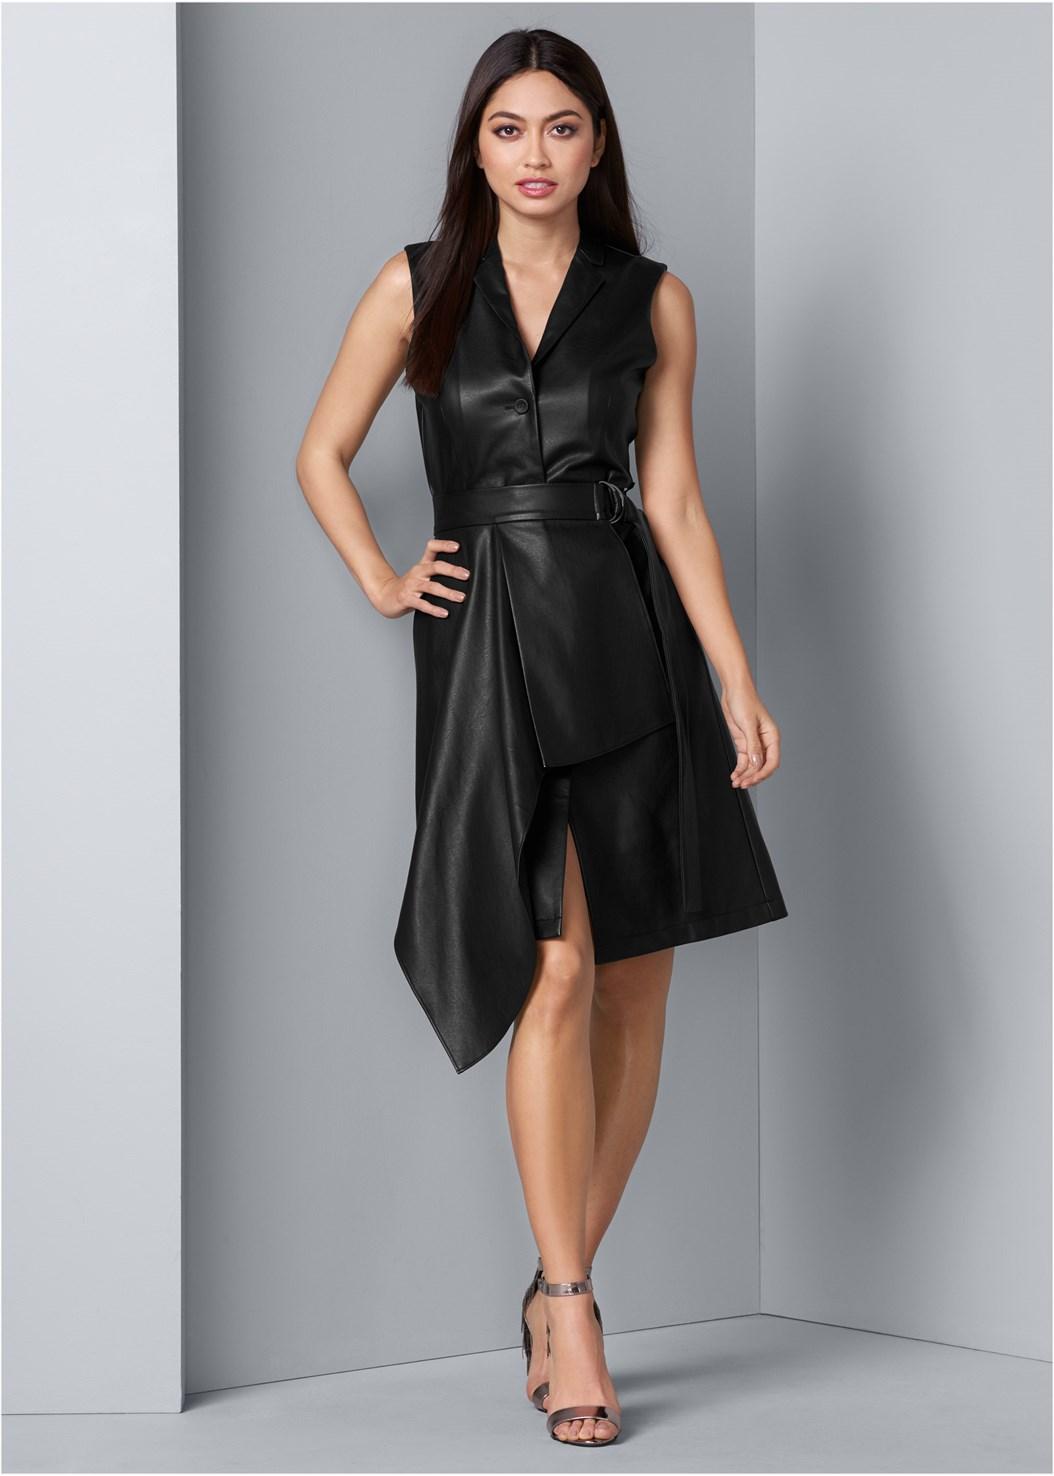 Faux Leather Wrap Dress,Push Up Bra Buy 2 For $40,Rhinestone Fringe Earrings